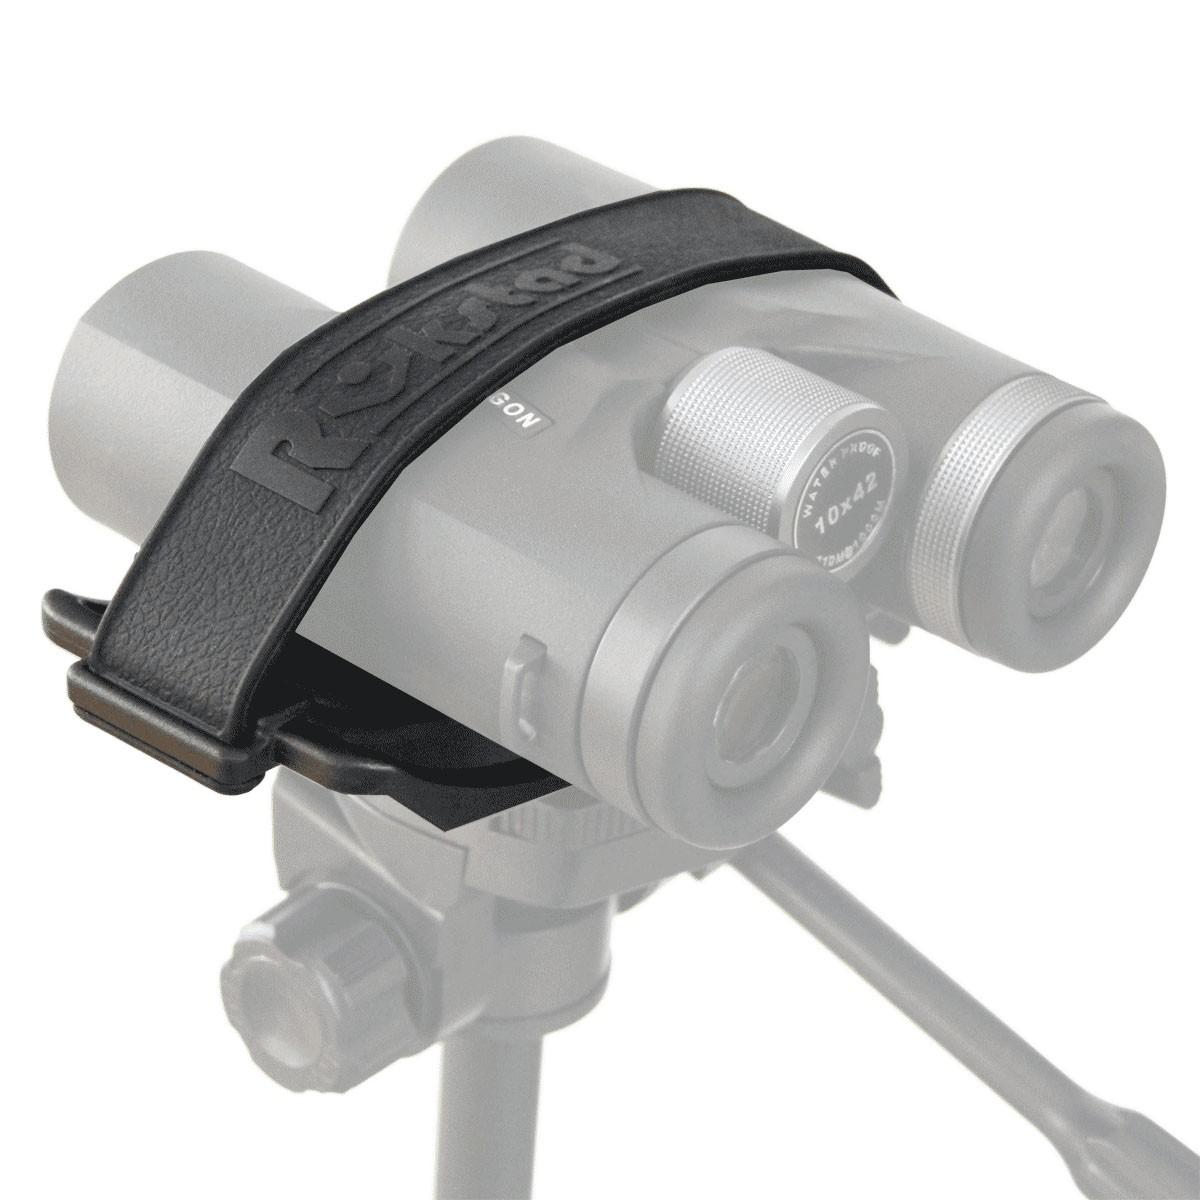 Binocular Tray Rest Mount